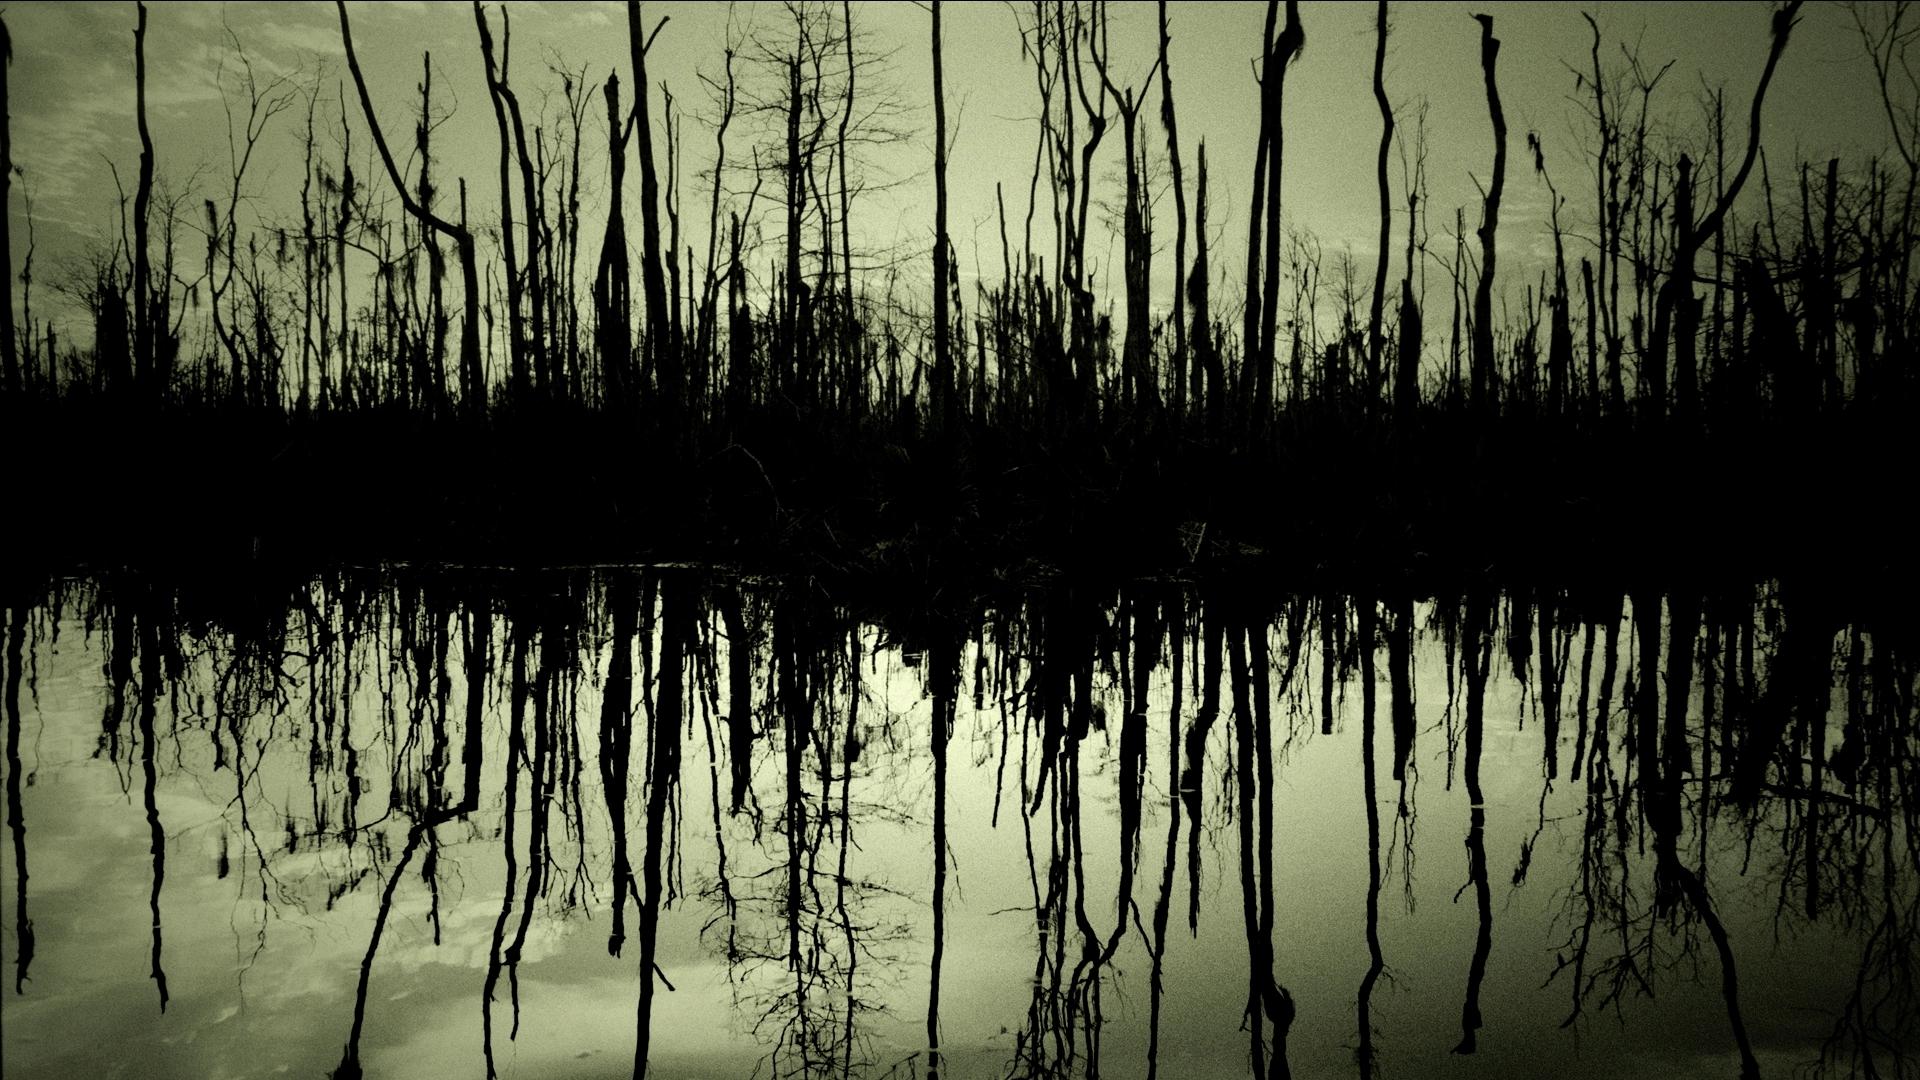 Swamp People Wallpaper